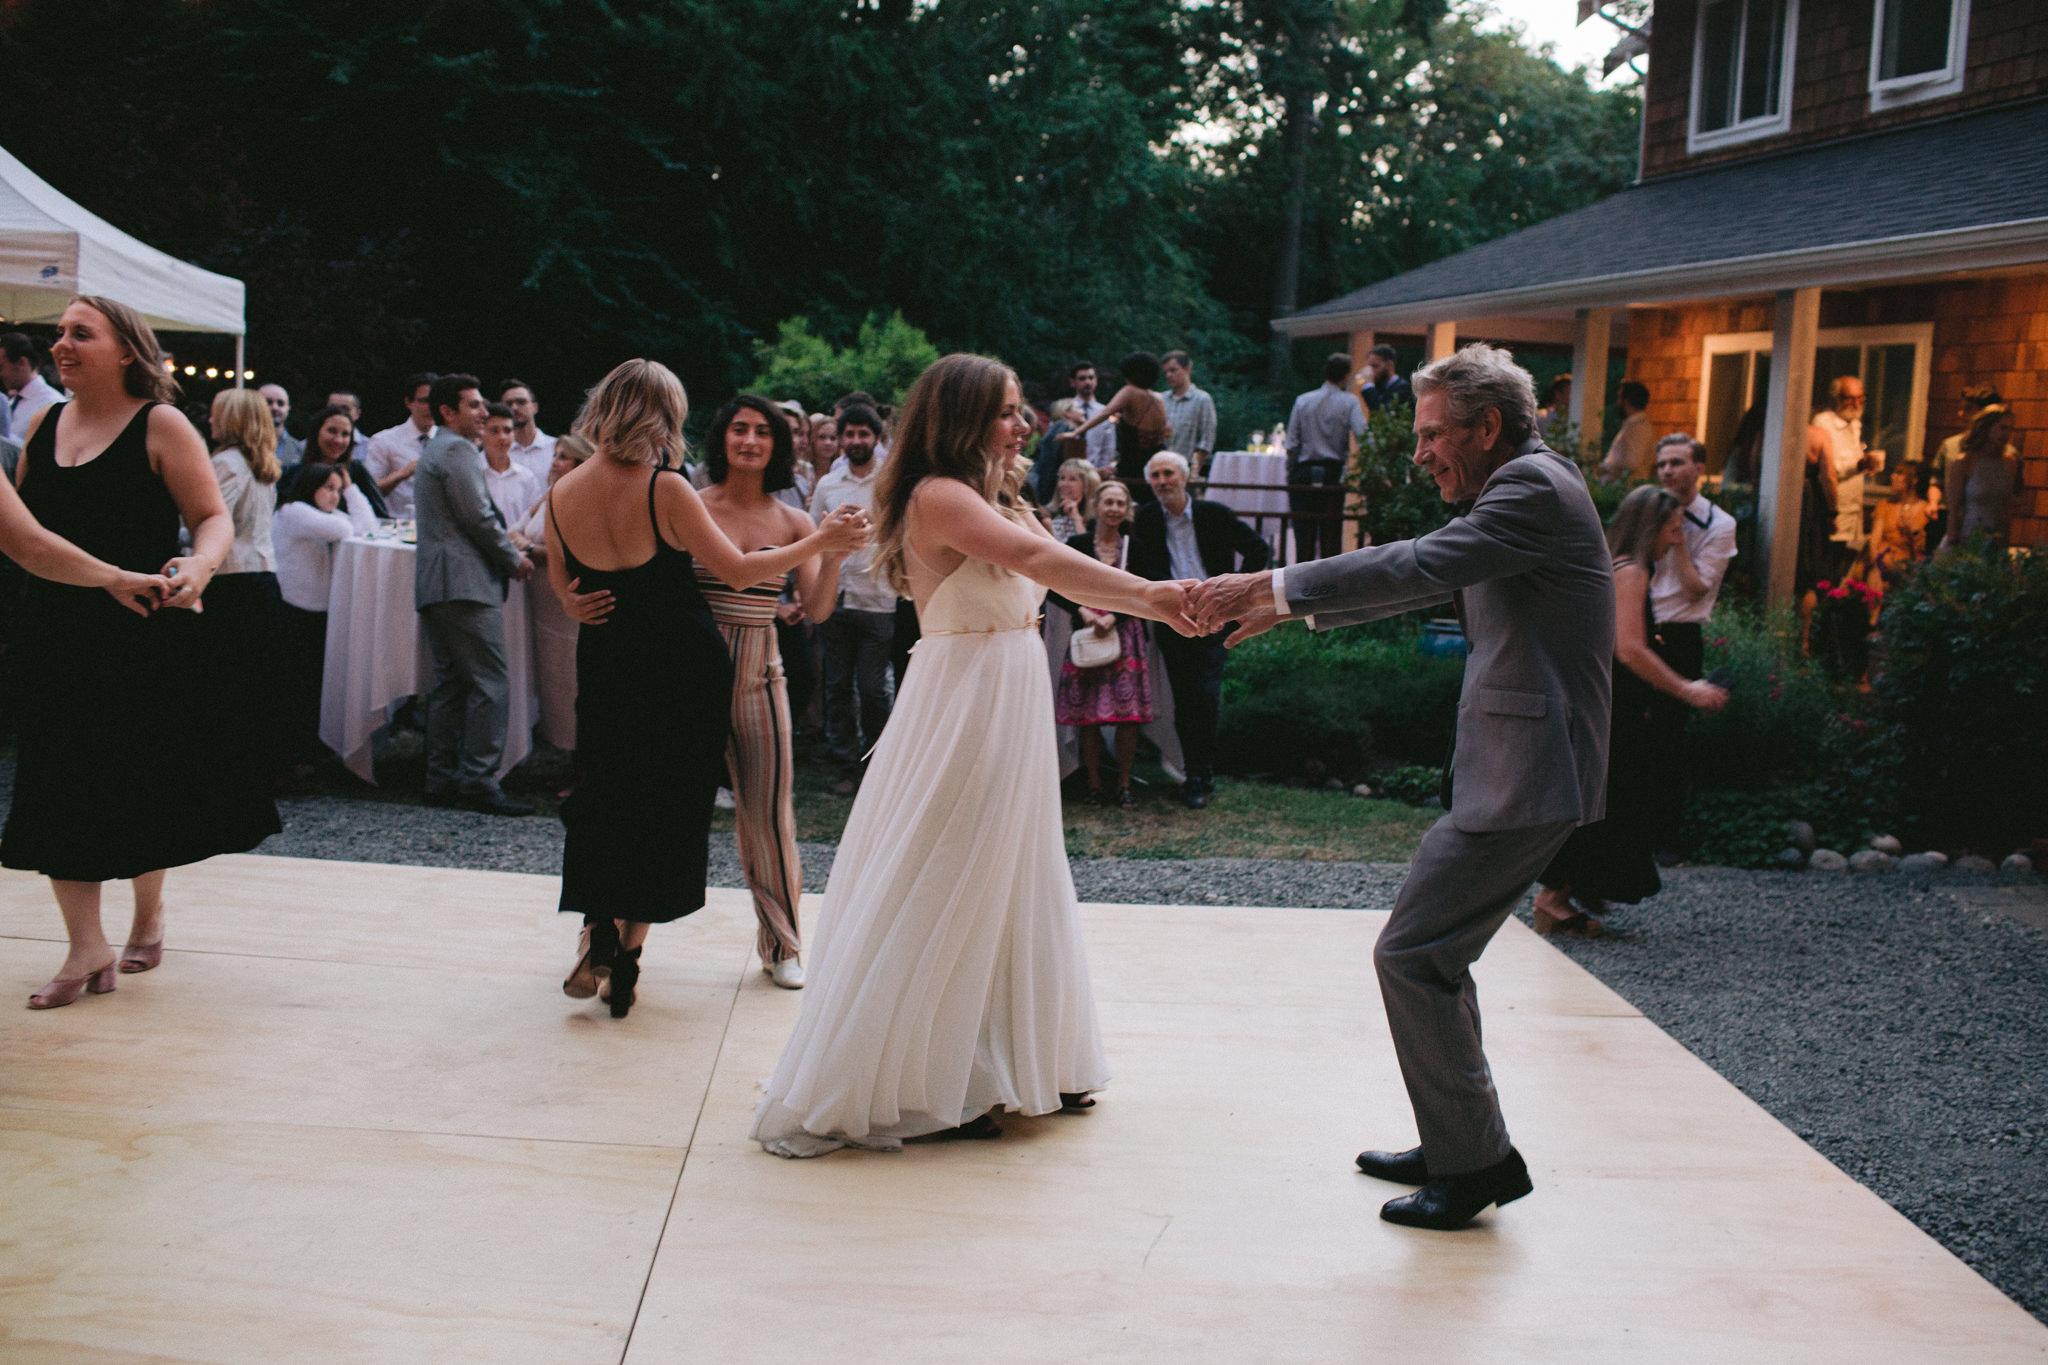 Backyard-Bainbridge-Island-Wedding-Alycia-Lovell-Photography-234.JPG